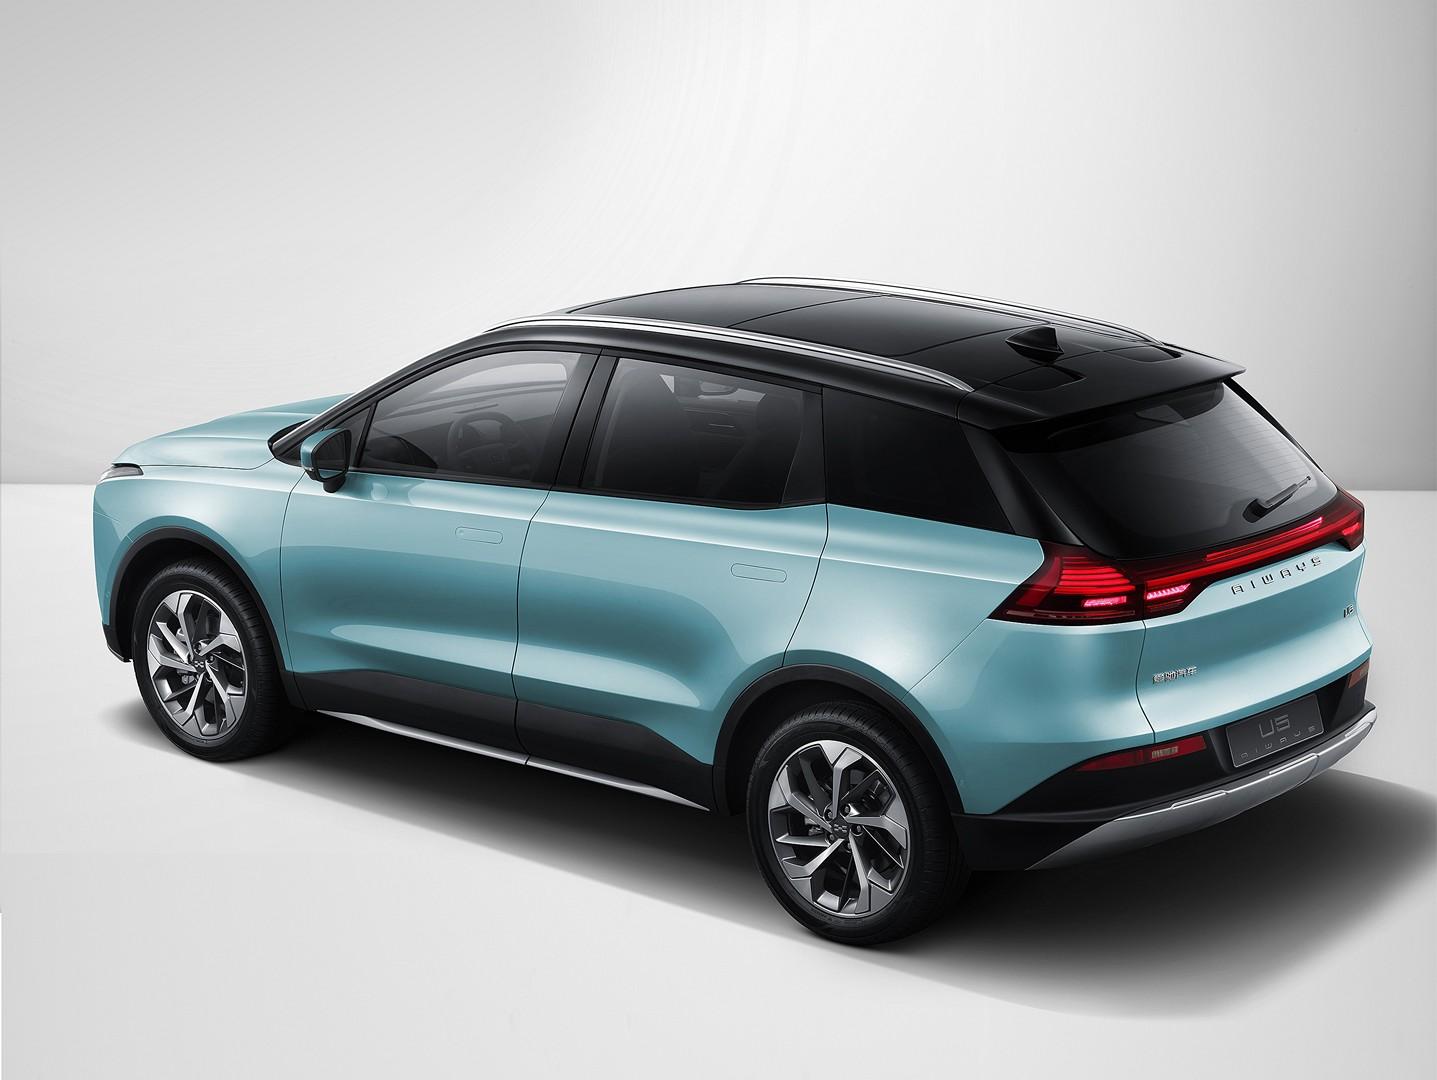 Hawtai B35 SUV Second Try: A Premium Chinese Cayenne Clone - autoevolution